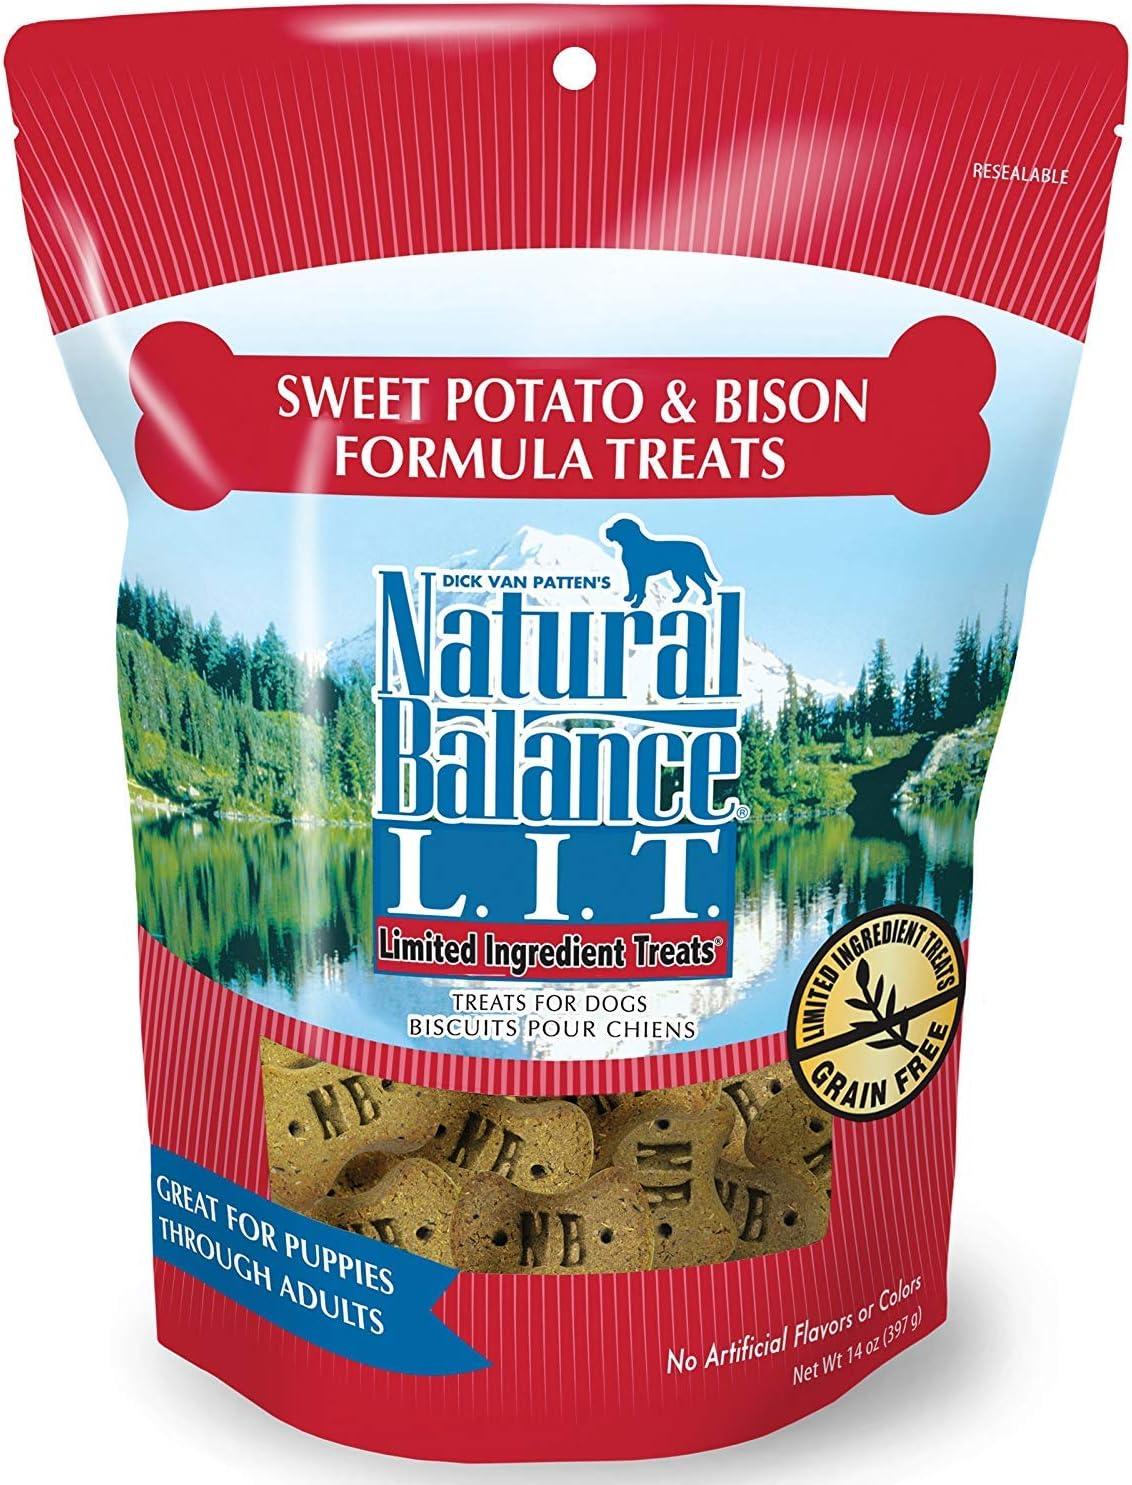 Natural Balance Limited Ingredient Dog Treats, 2 pack